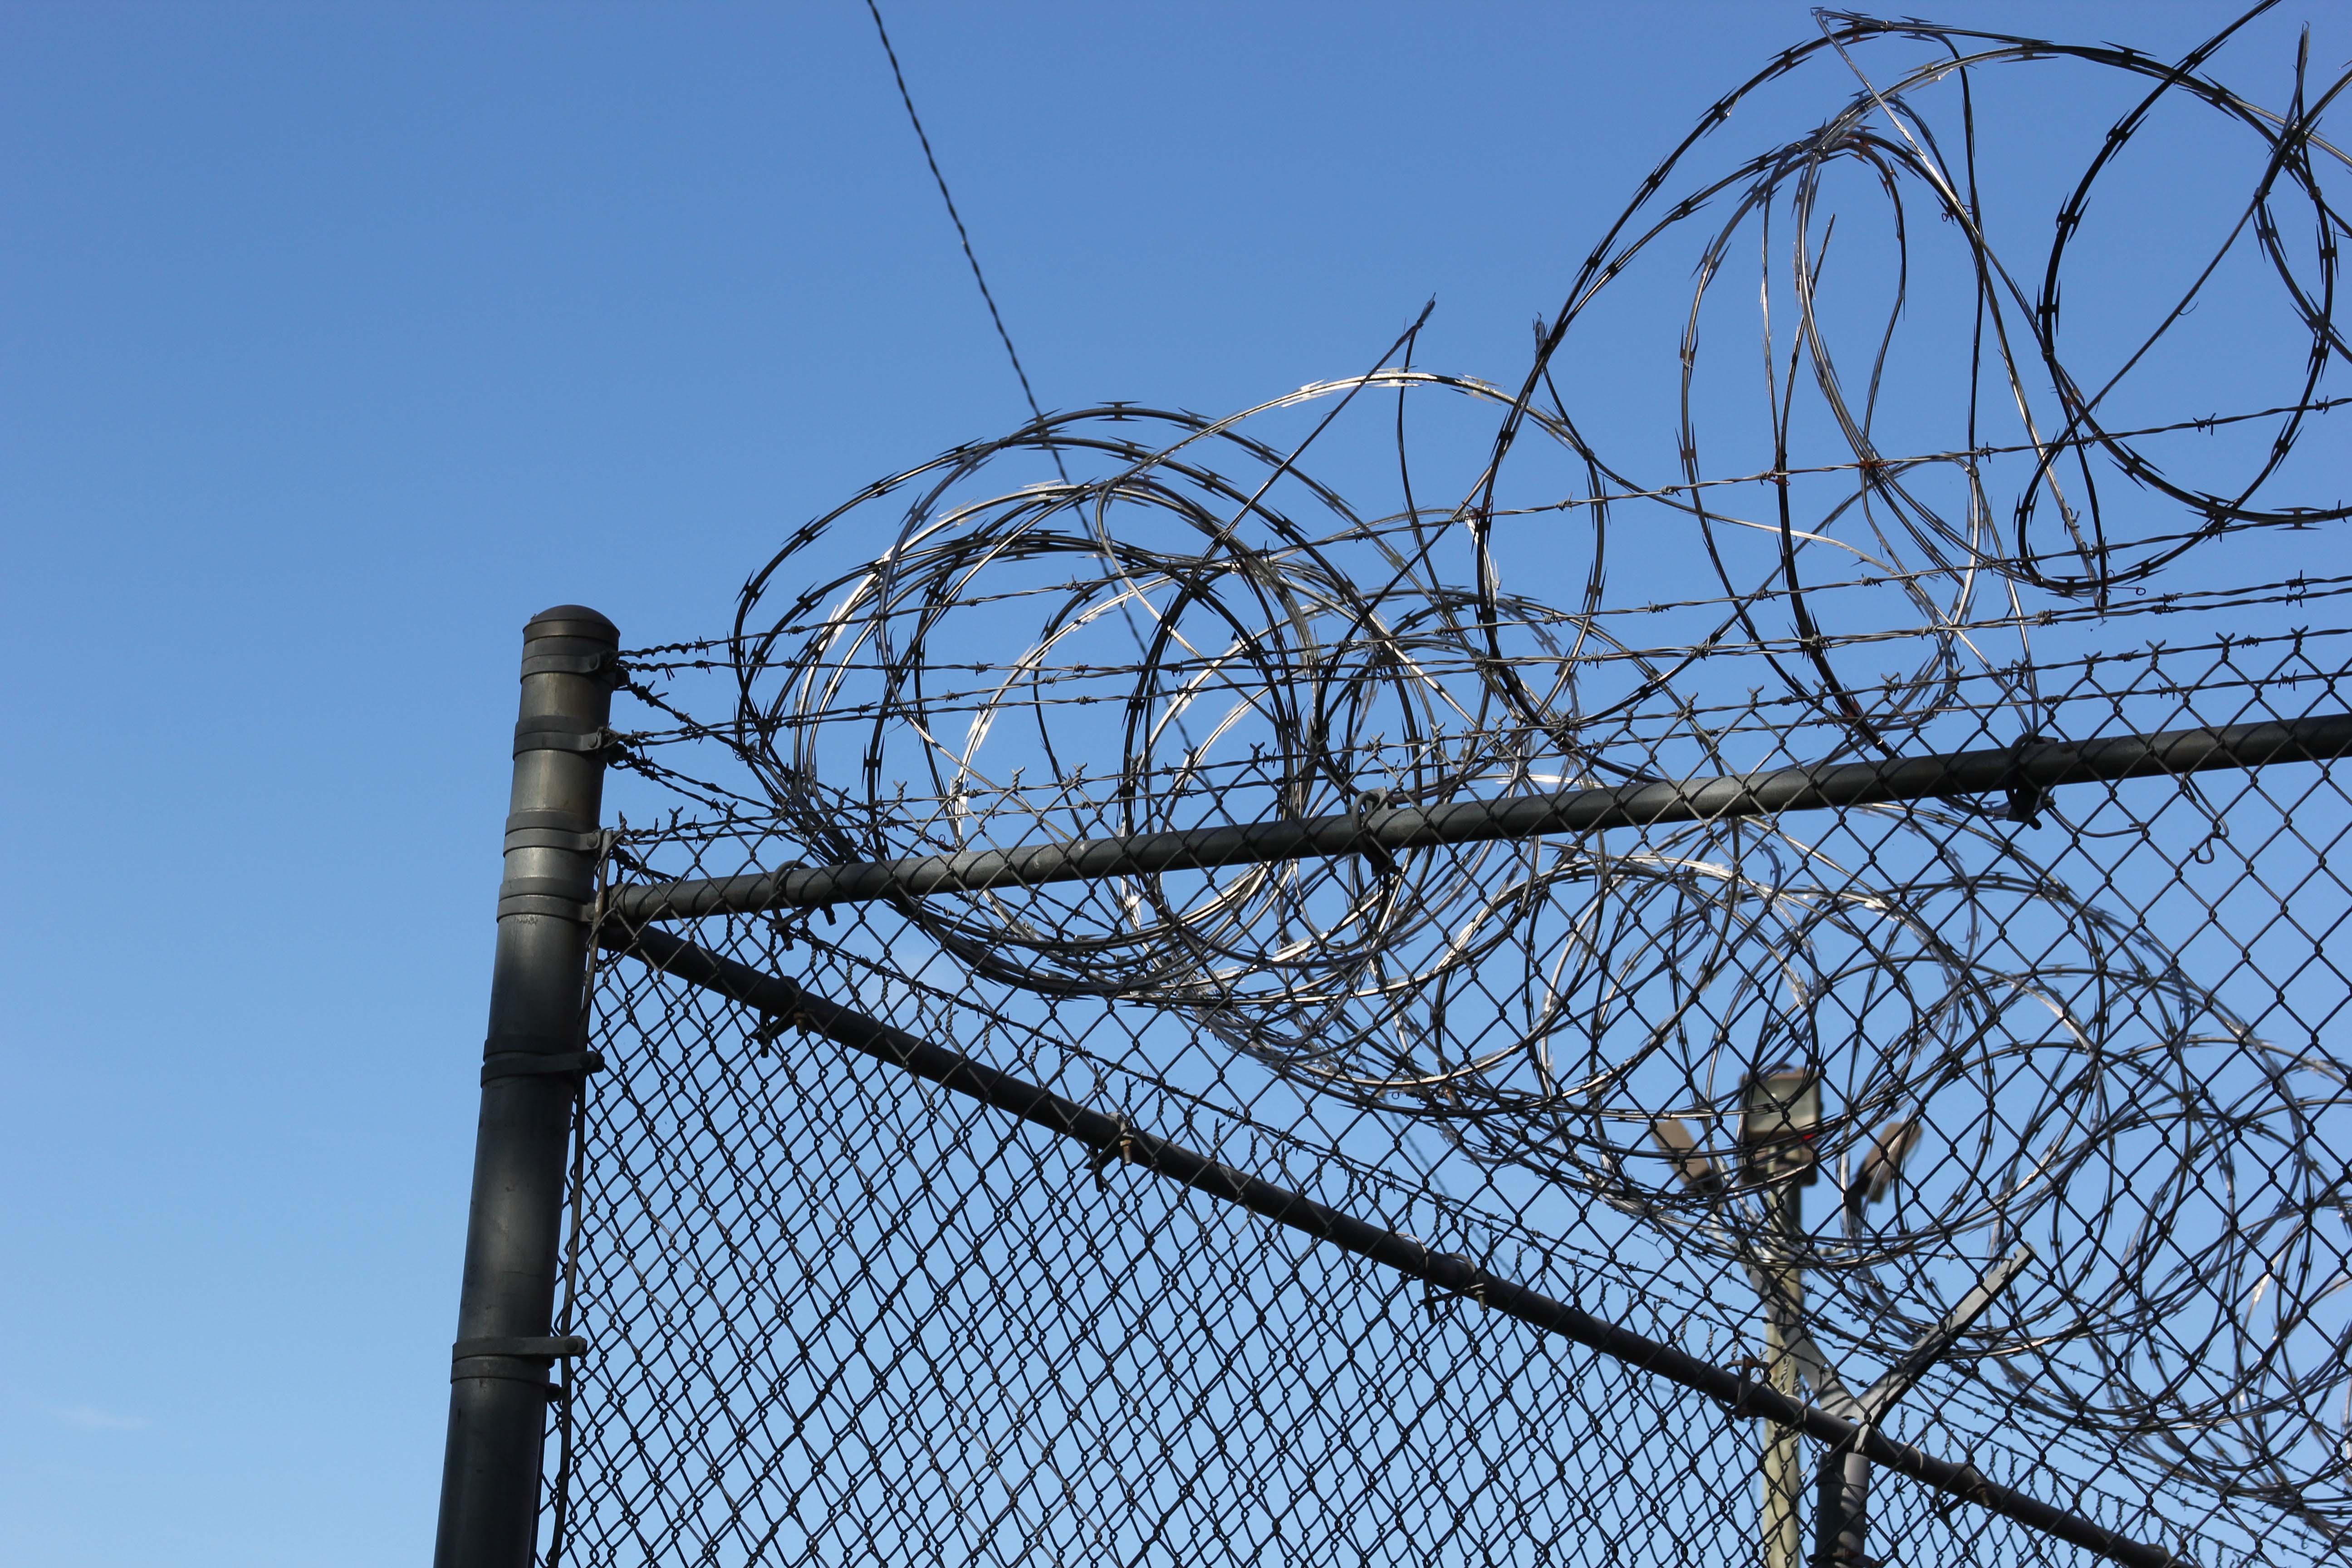 Walker Co. jailbreak details emerge – The Trussville Tribune